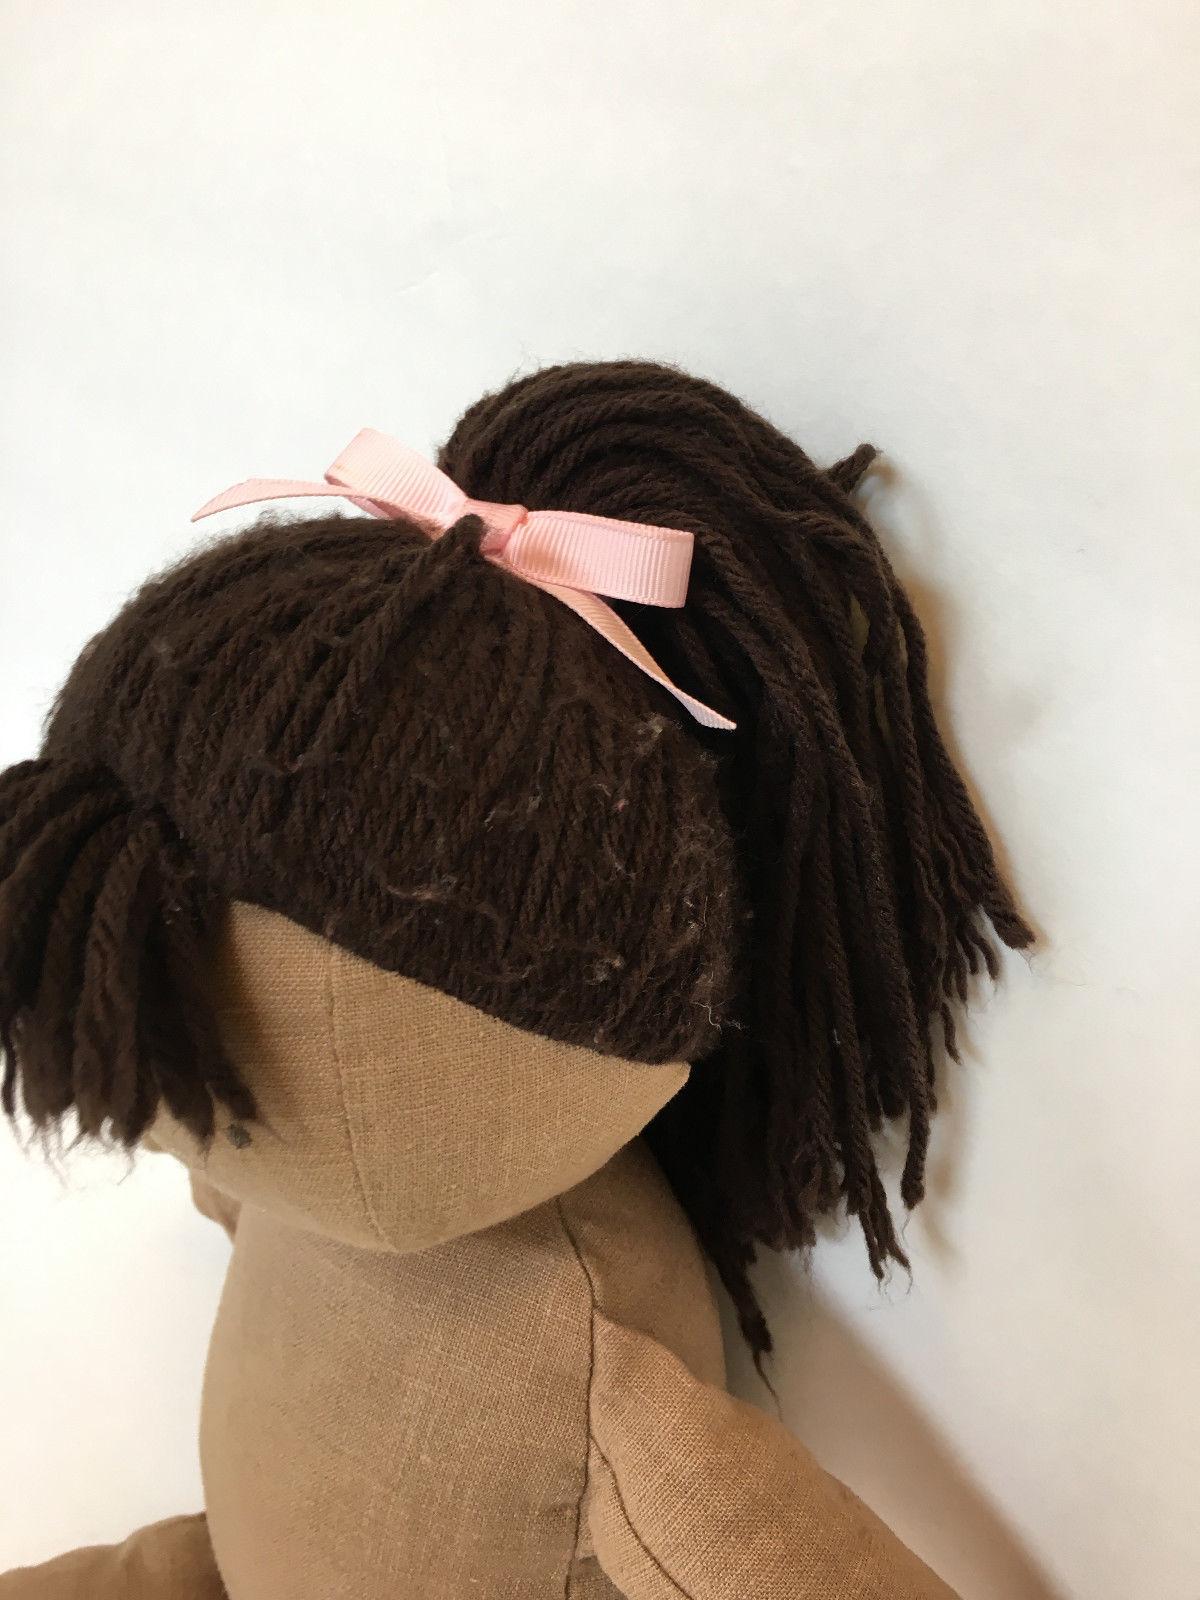 L16 Pottery Barn Kids Erin Doll African American Plush